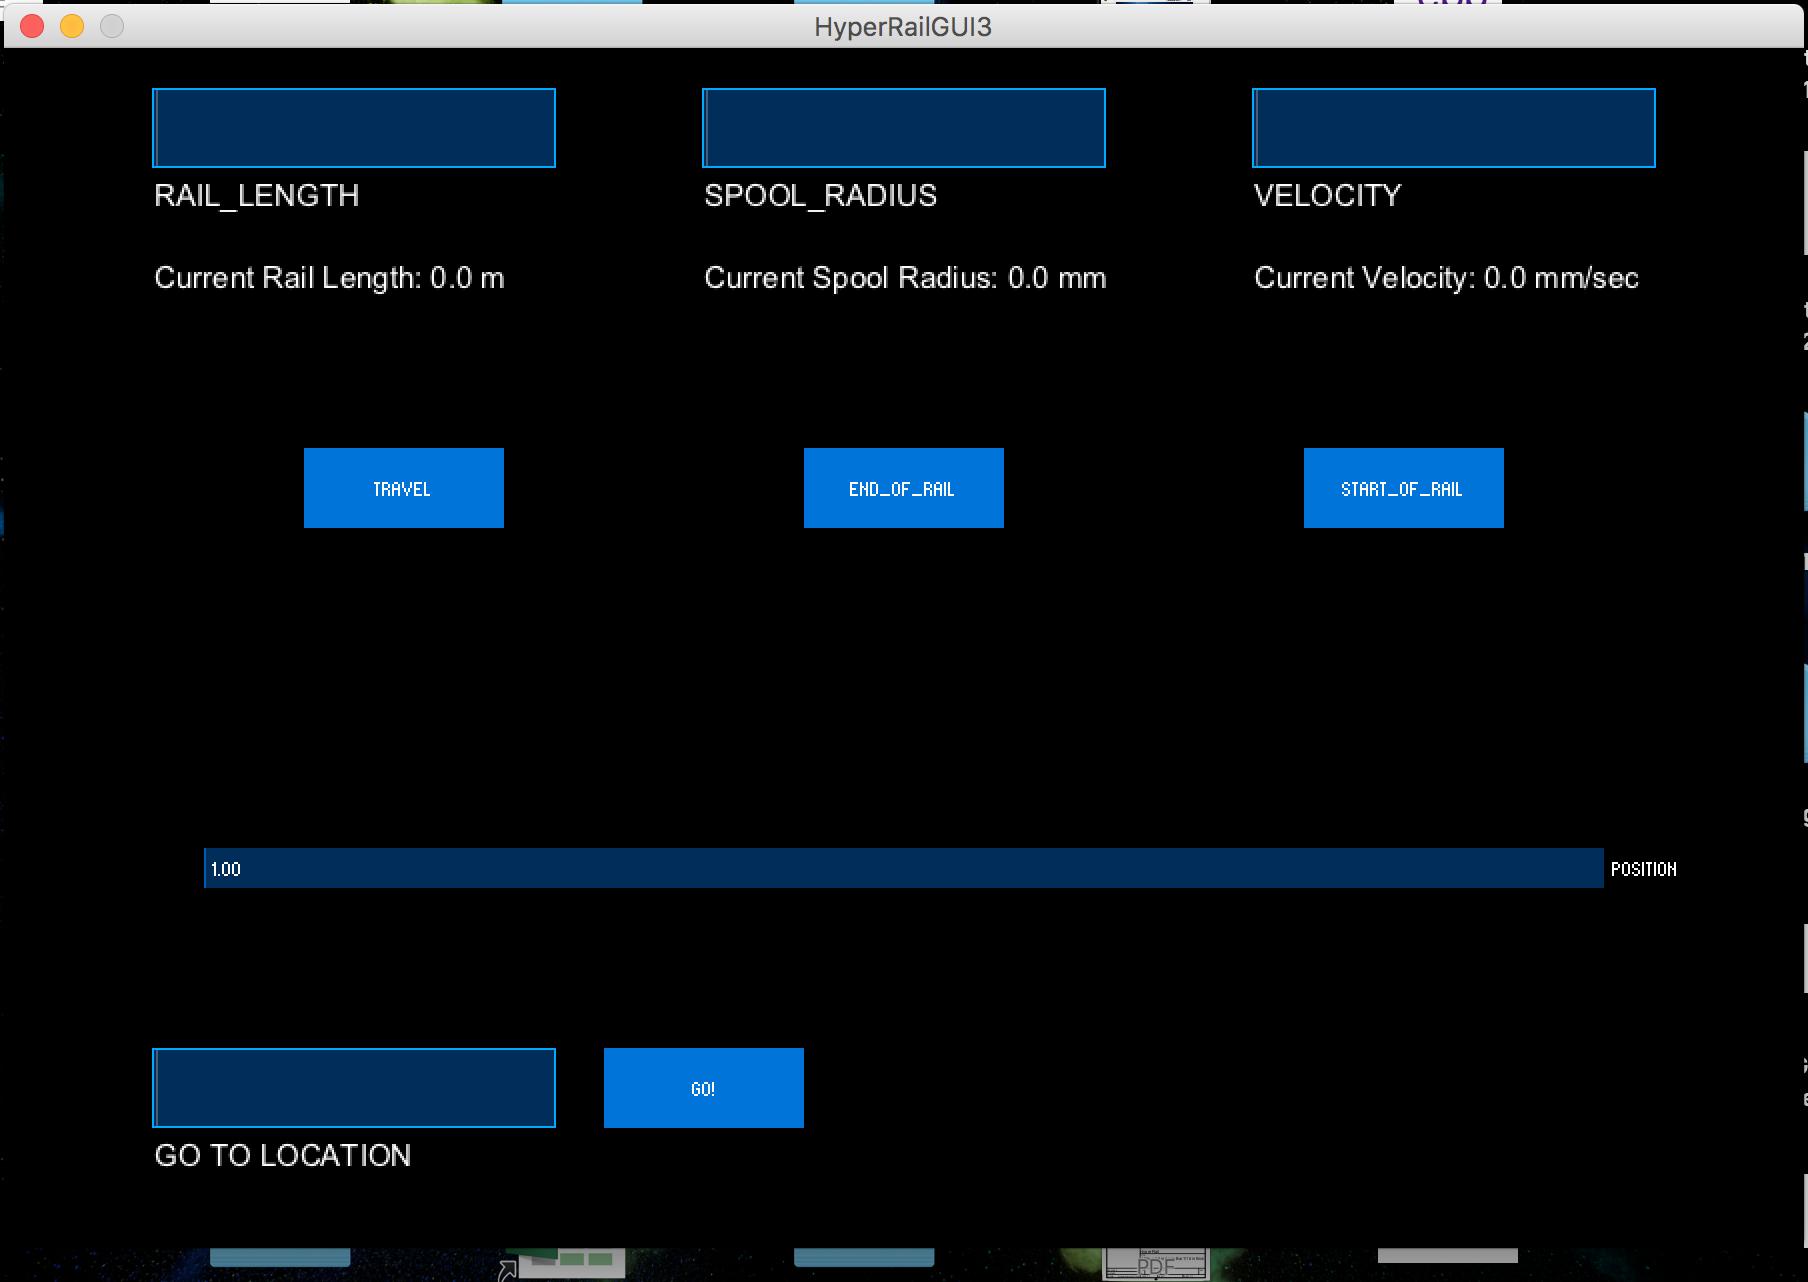 HyperRail application